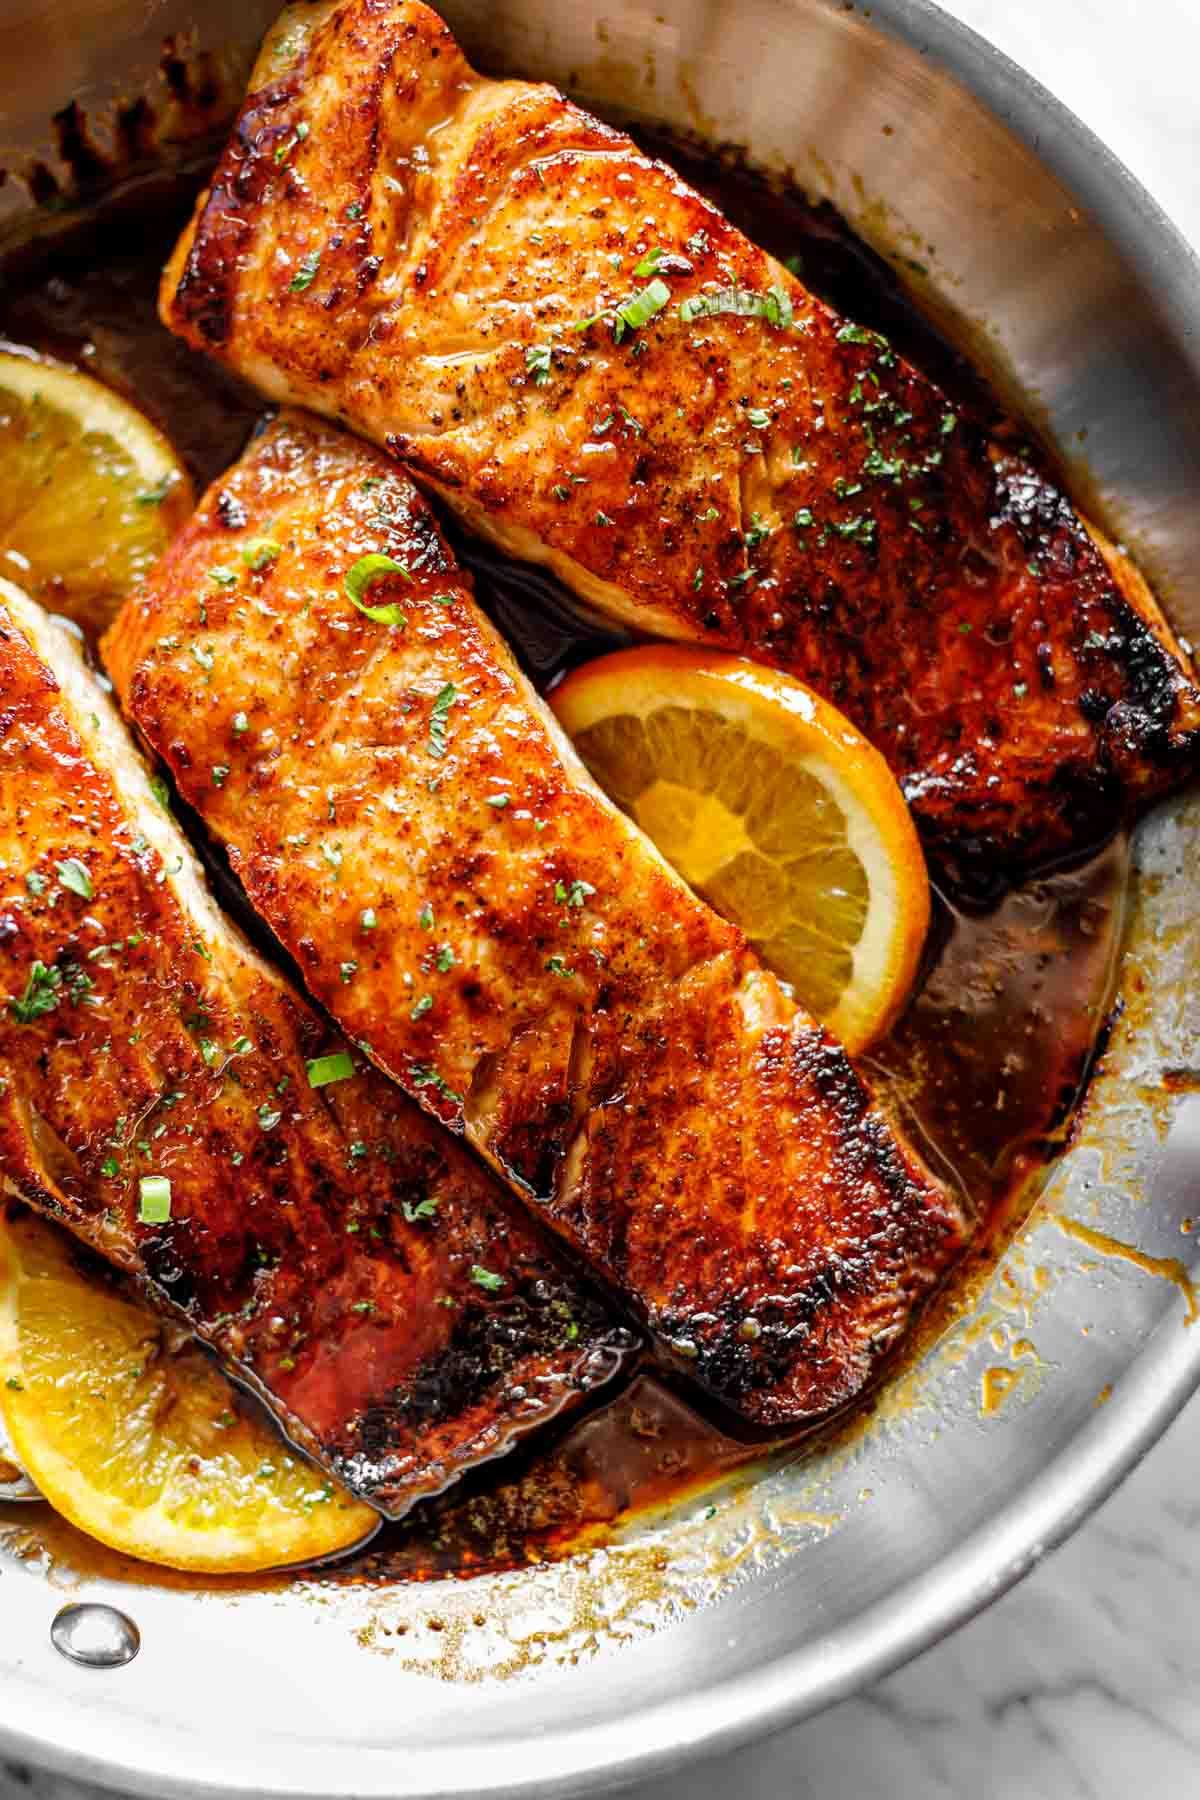 Crispy Honey Orange Glazed Salmon Honey Salmon Recipes Orange Glazed Salmon Crockpot Salmon Recipe